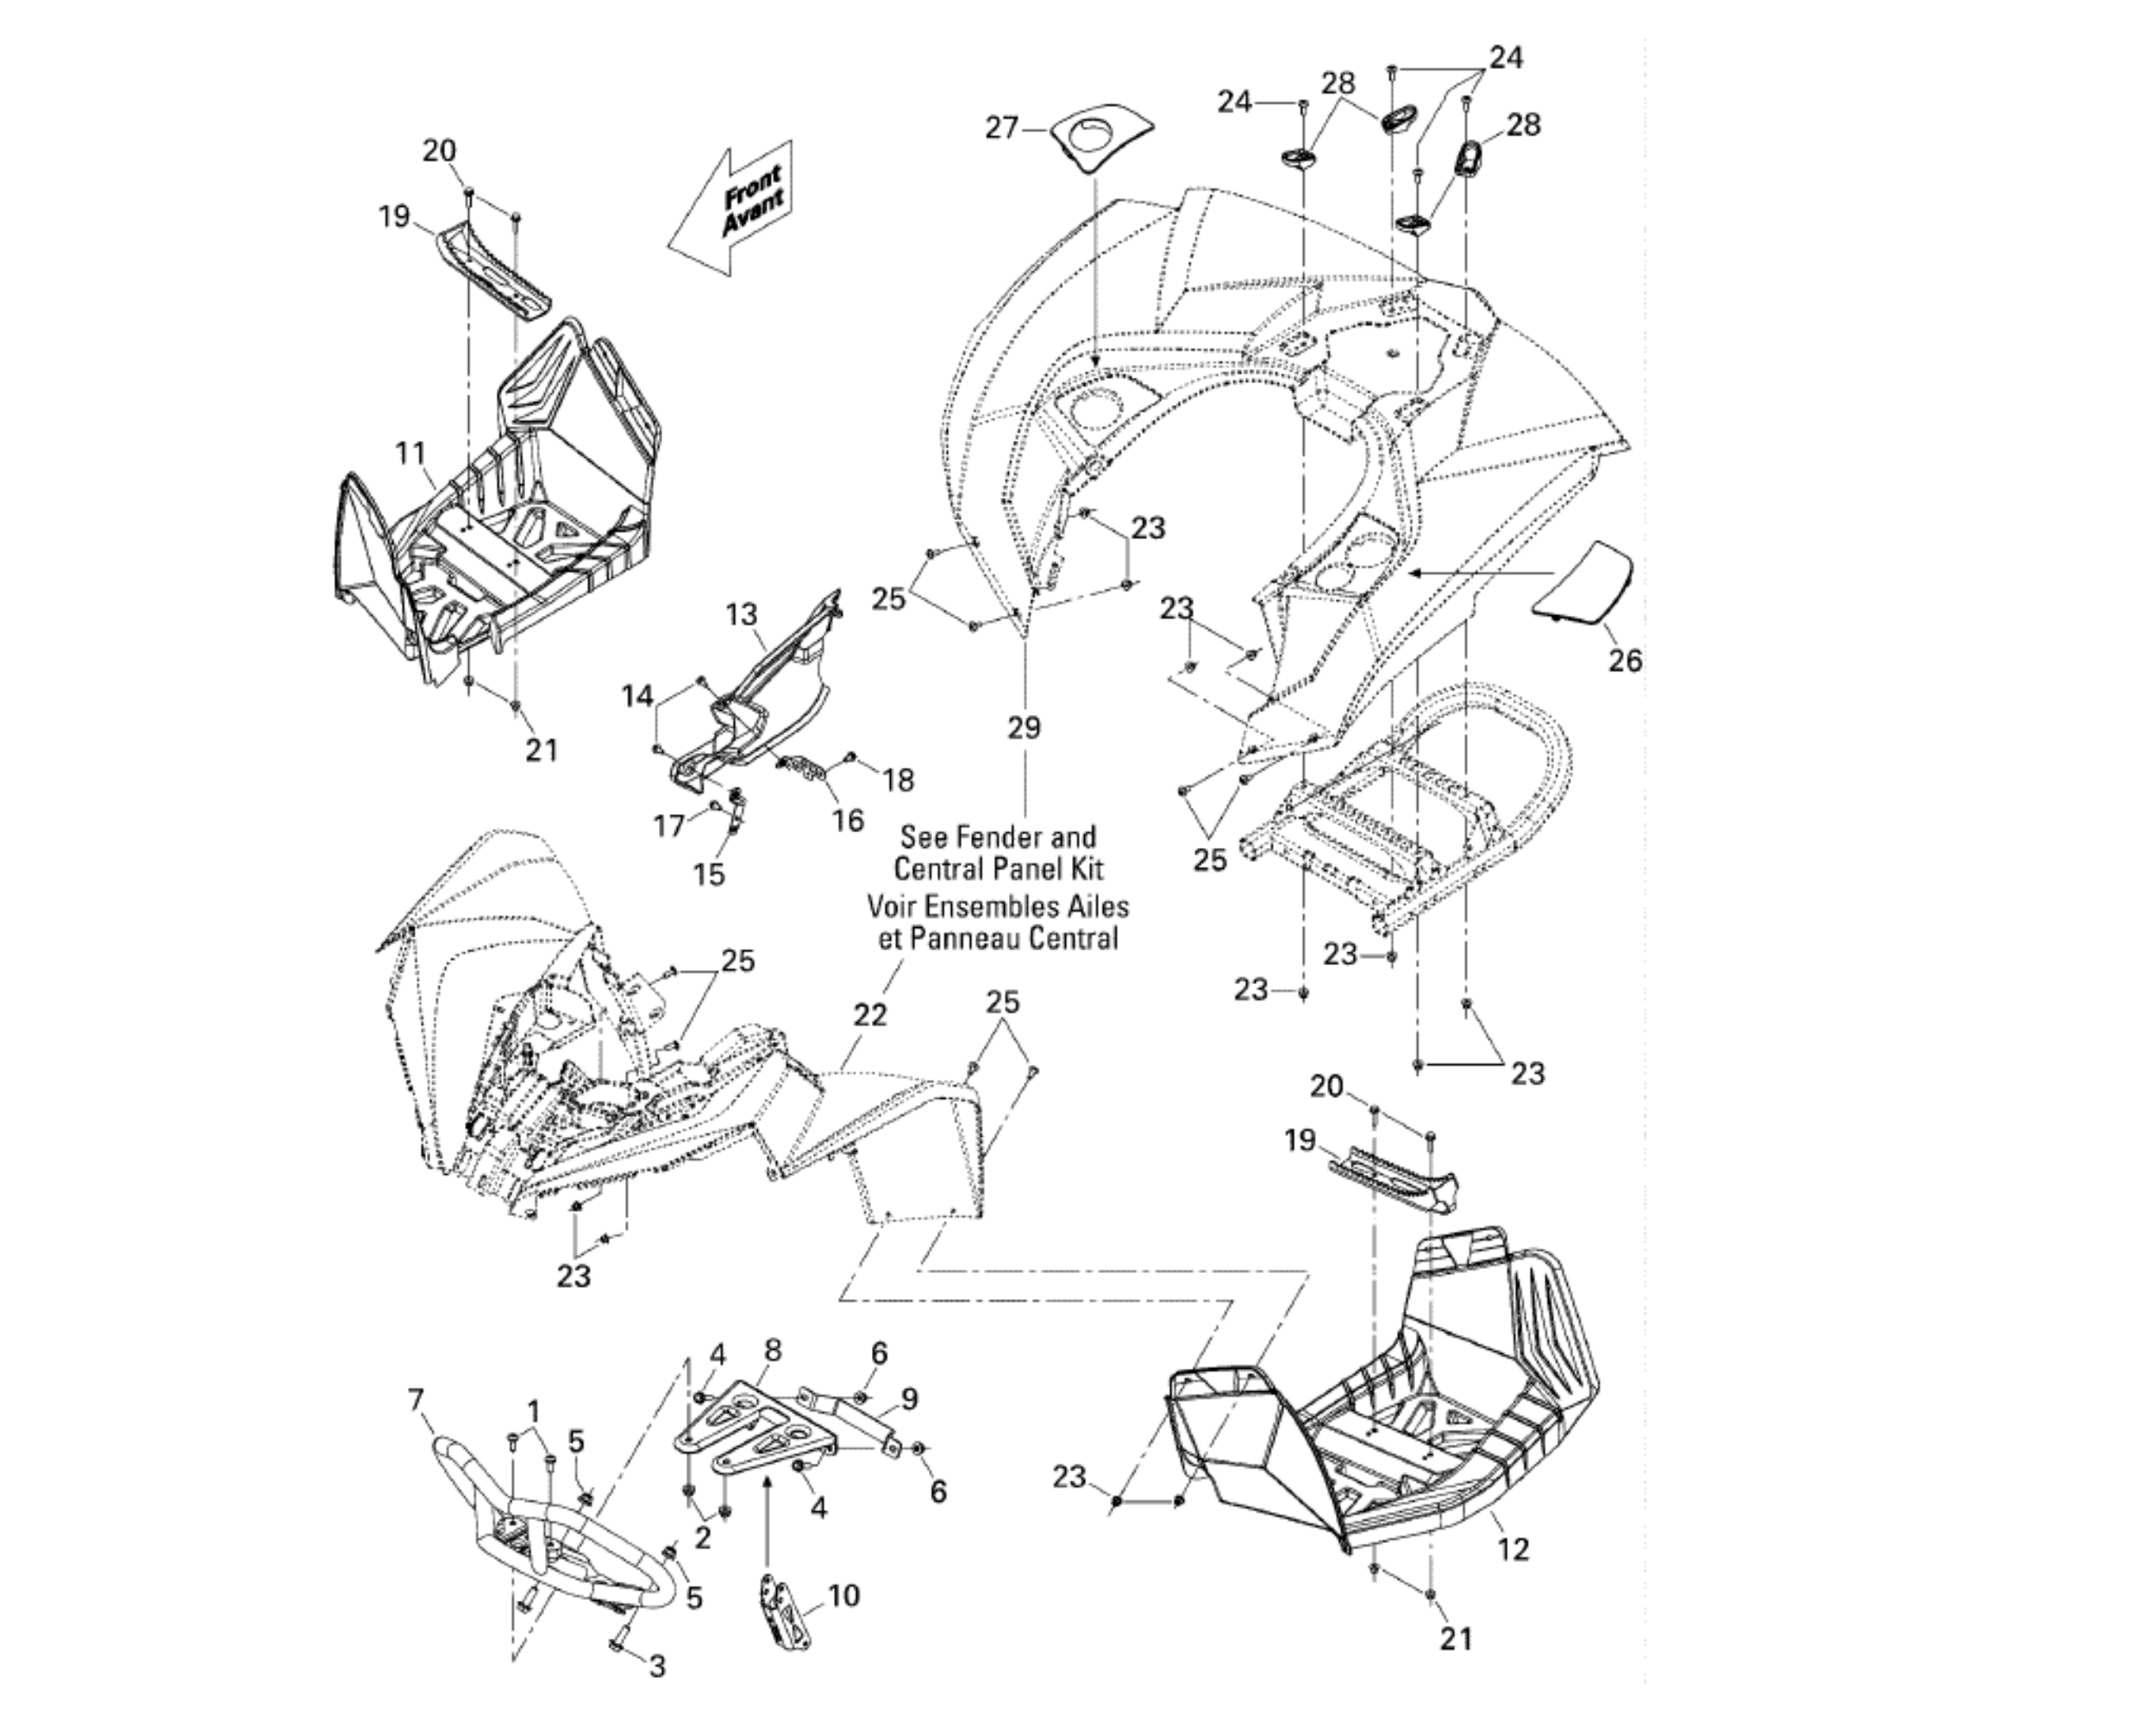 Großzügig Systemkesseldiagramm Fotos - Schaltplan Serie Circuit ...